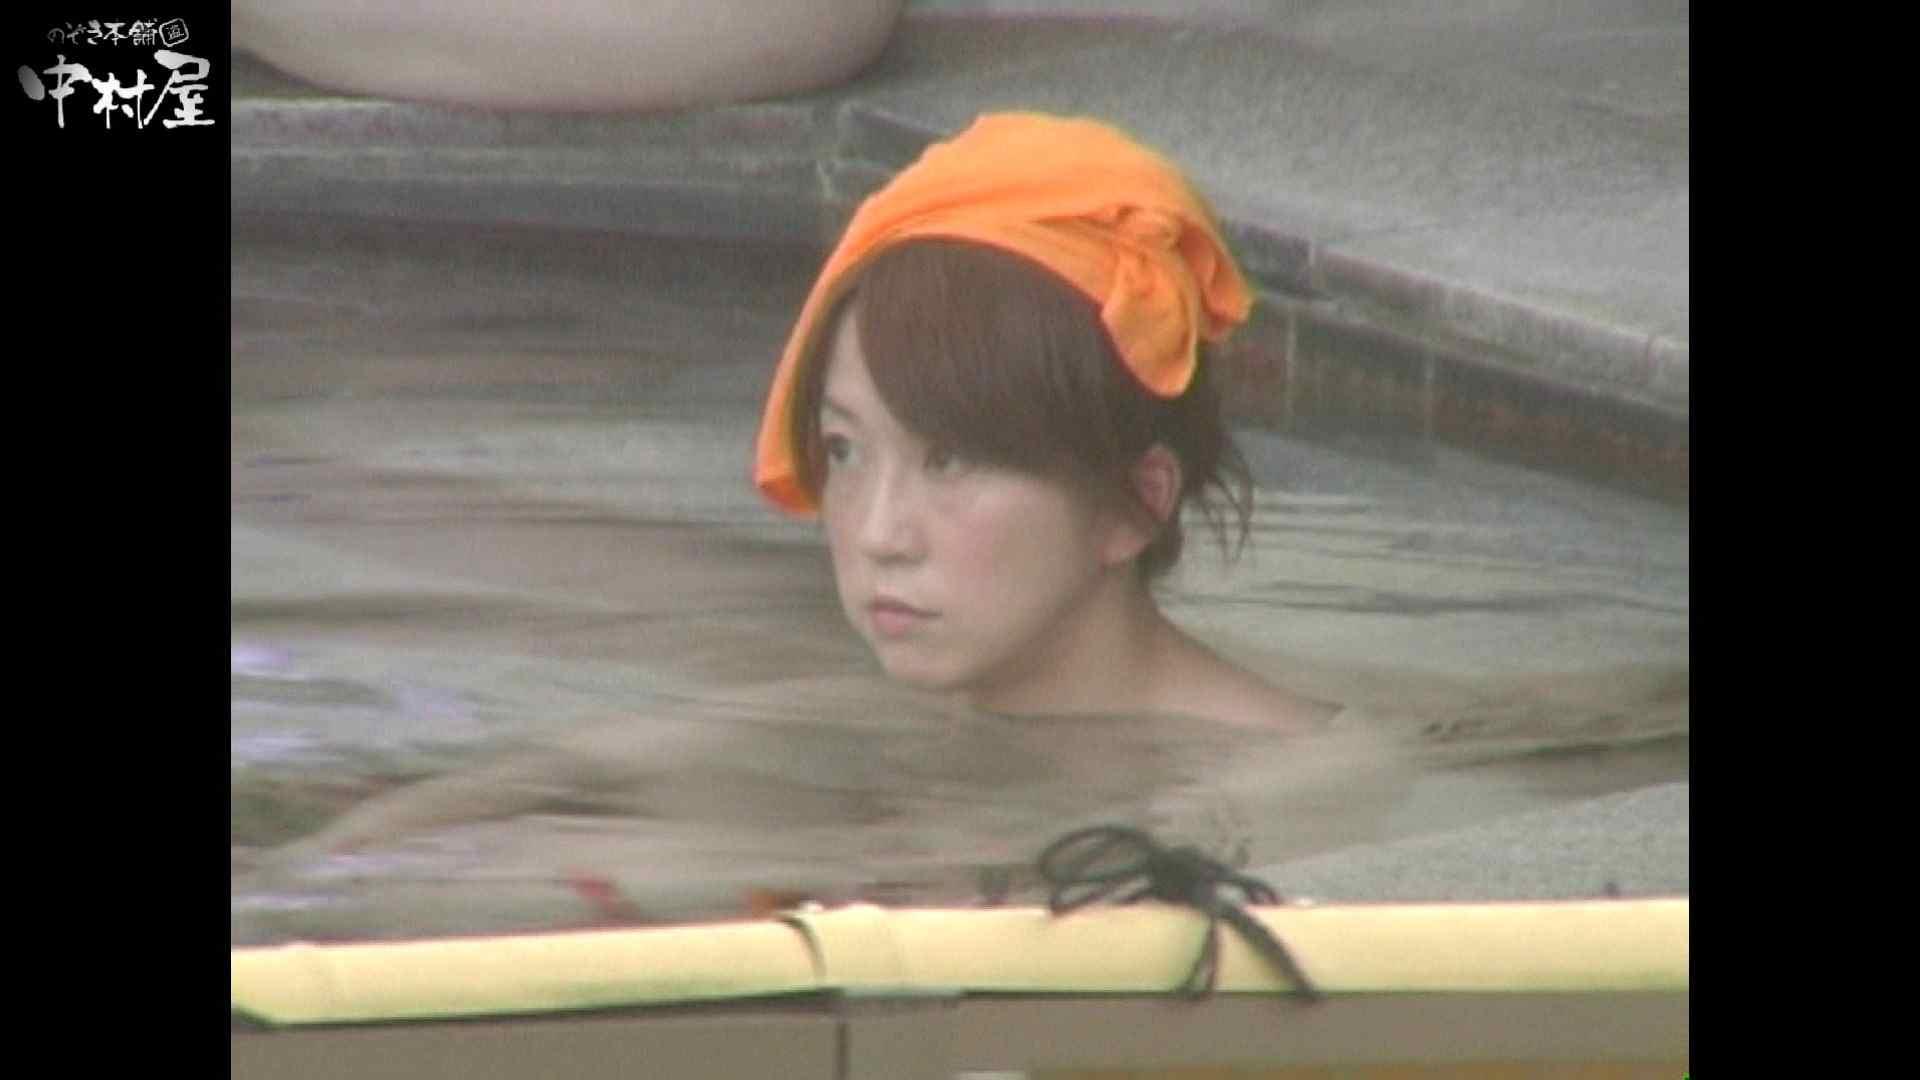 Aquaな露天風呂Vol.941 盗撮師作品  76pic 30